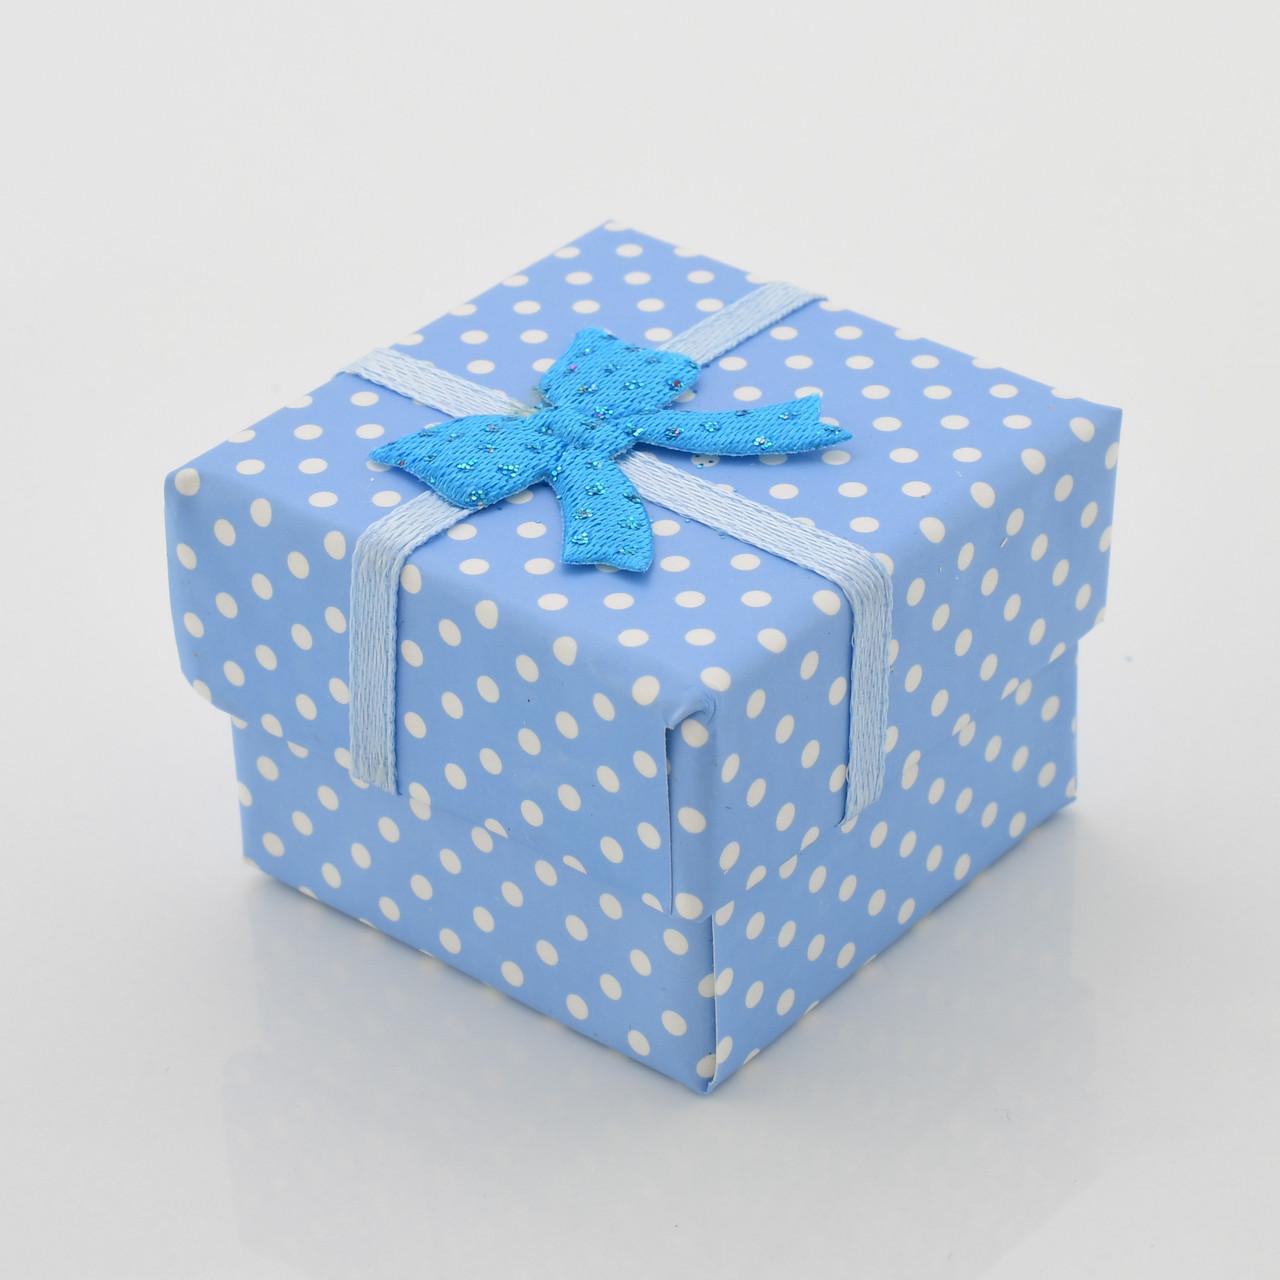 Коробочка маленькая для кольца серег синий цвет 741157 размер 4х4 см